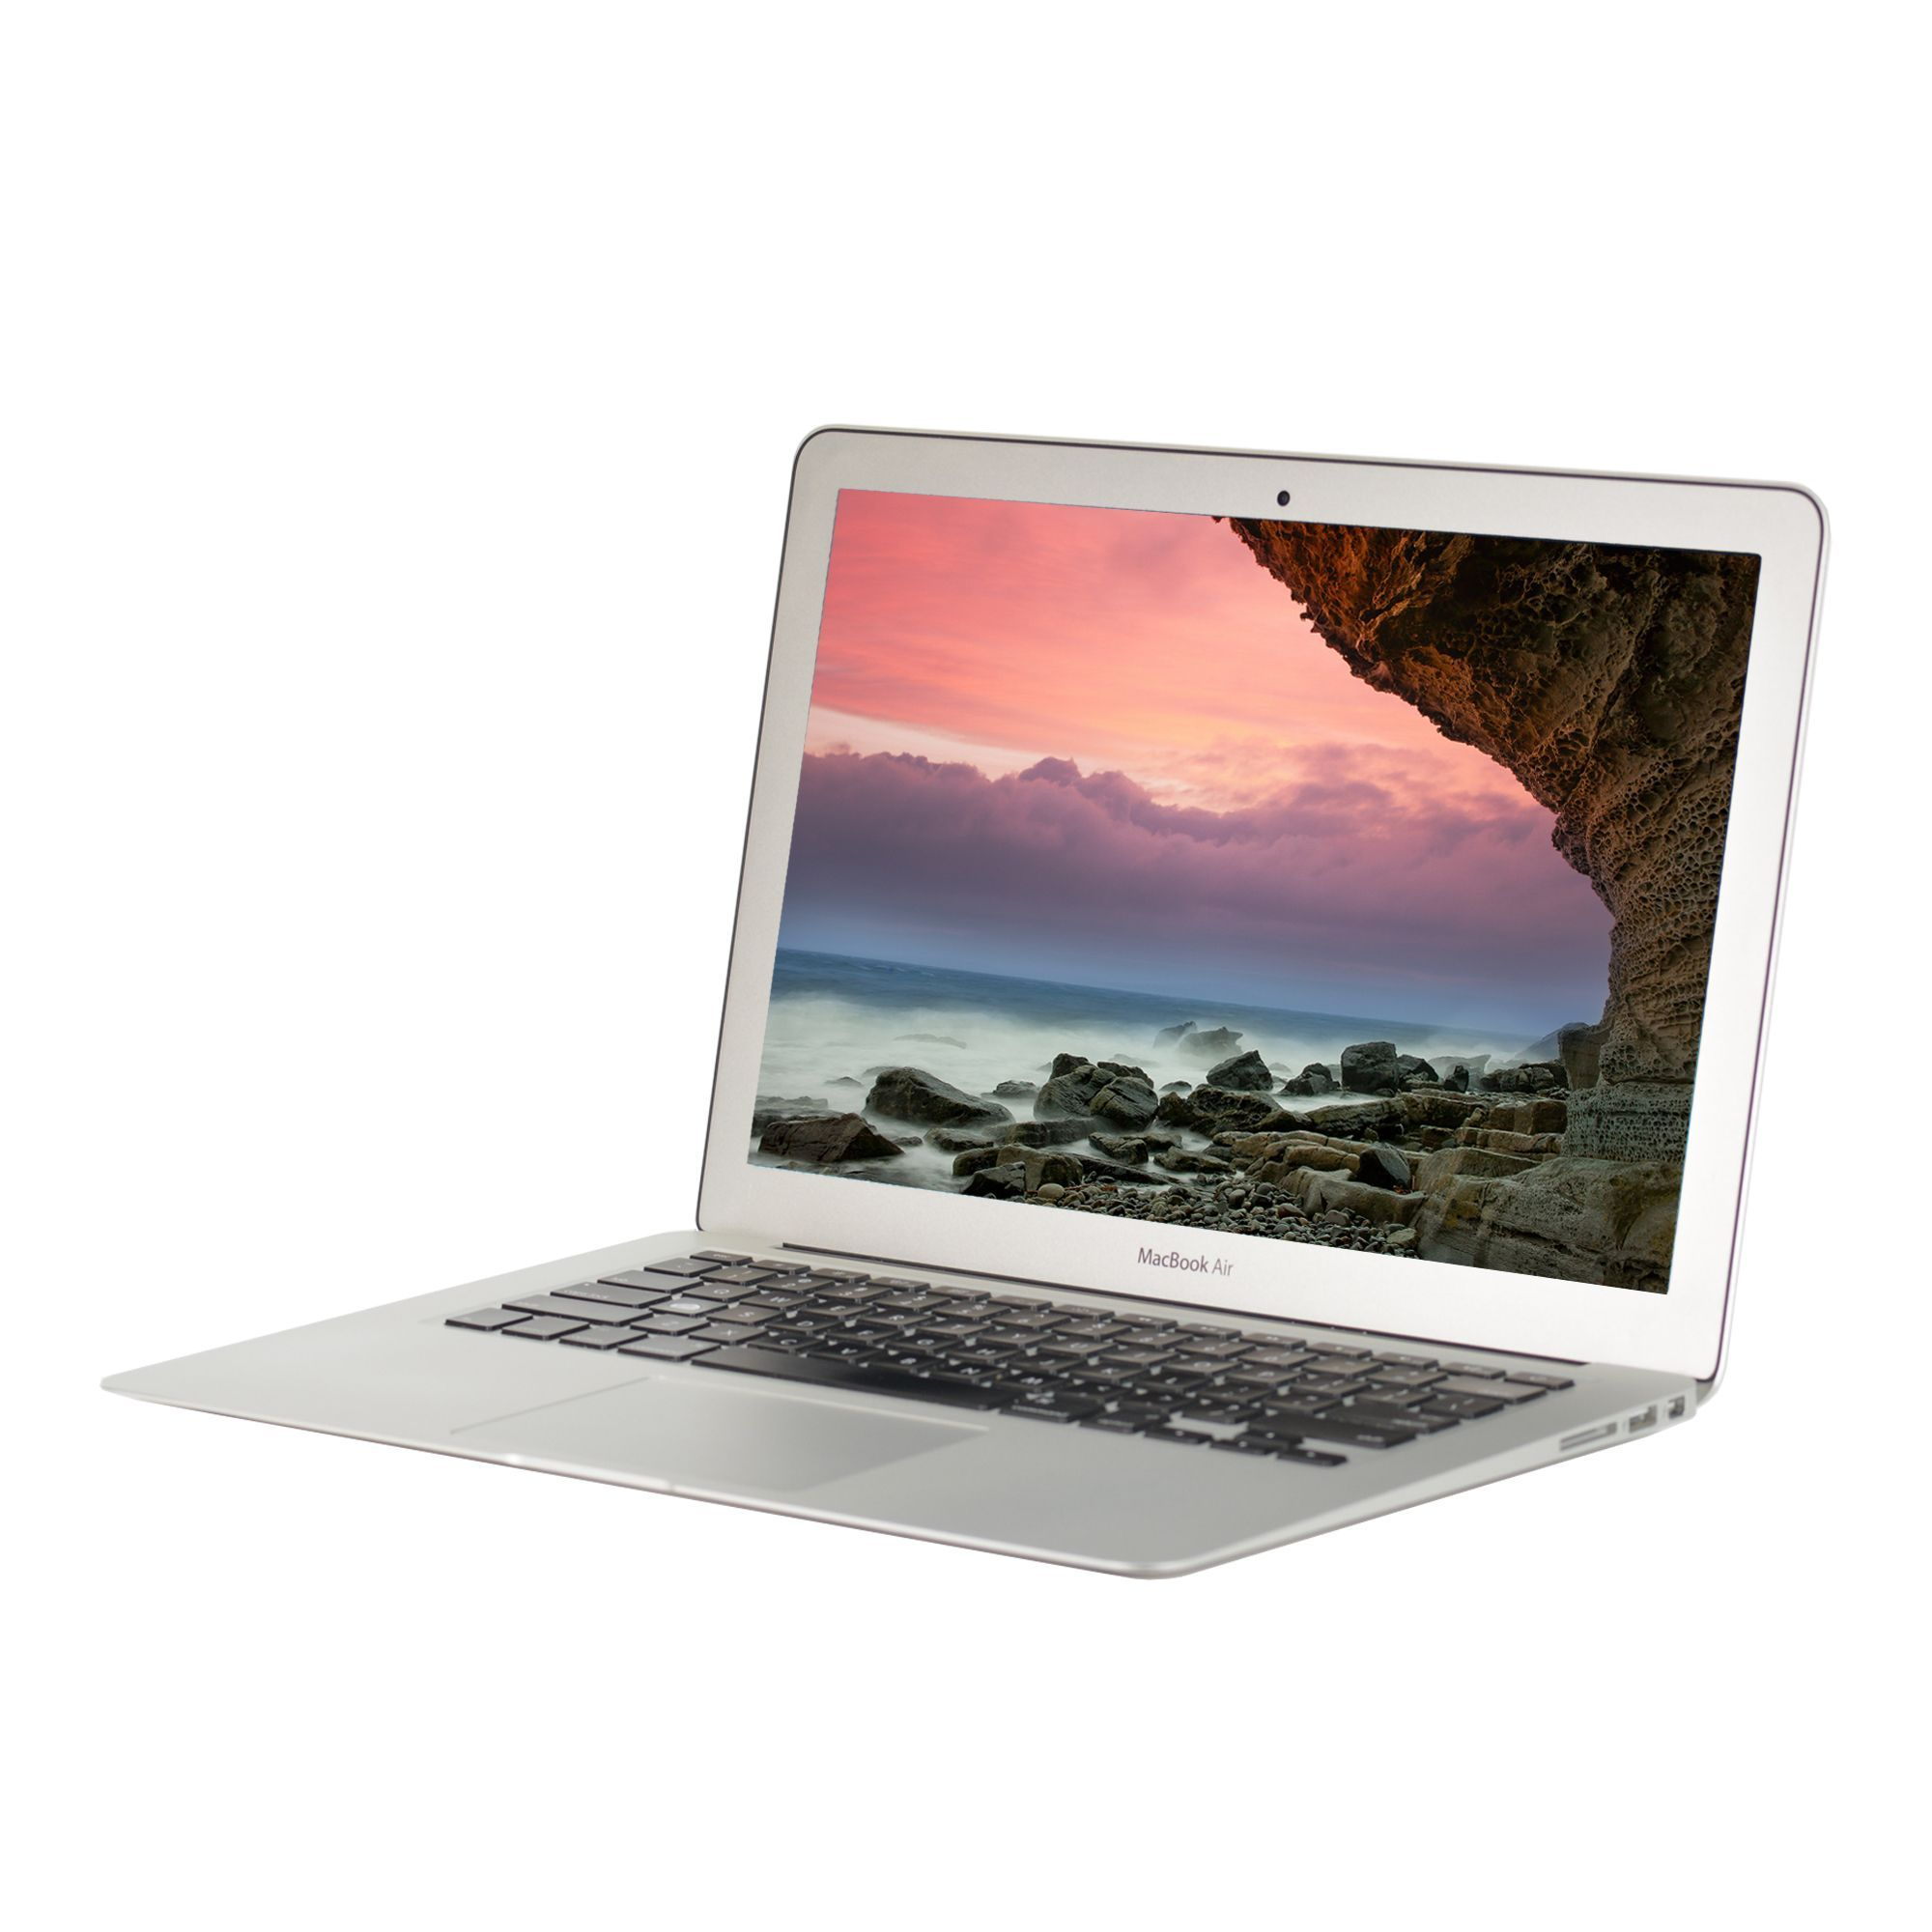 Macbook air latest os